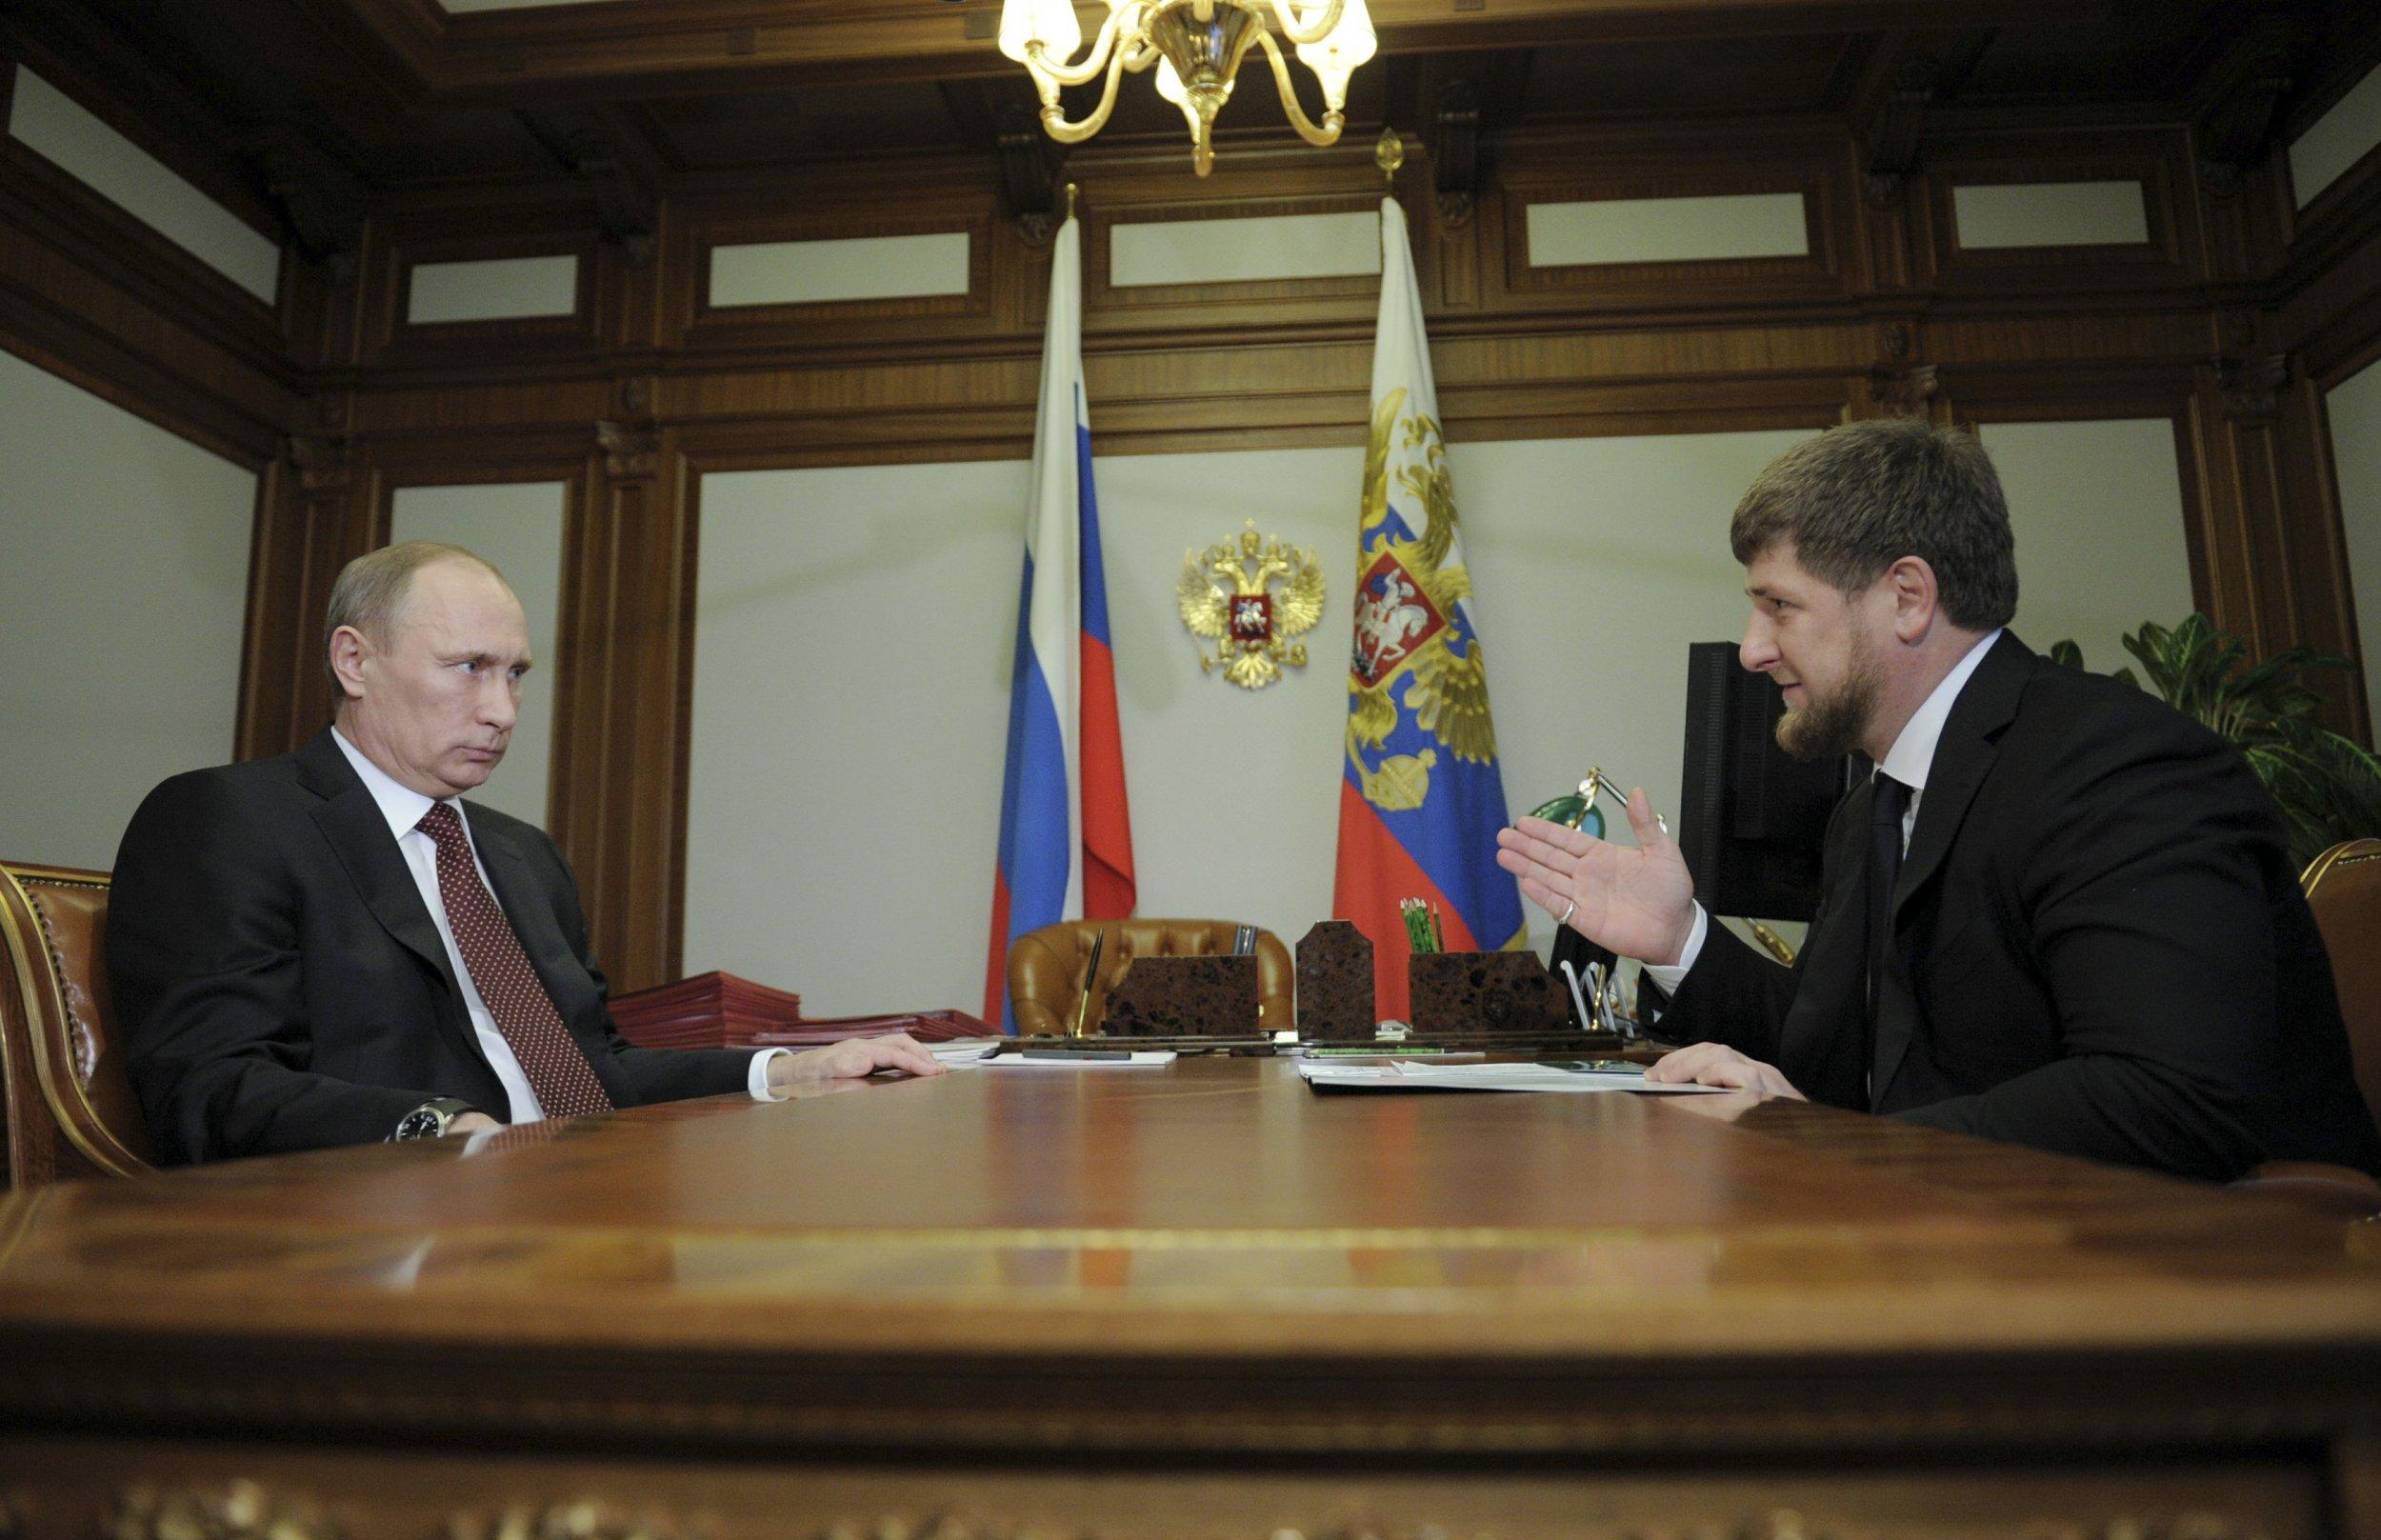 Putin glares at Kadyrov